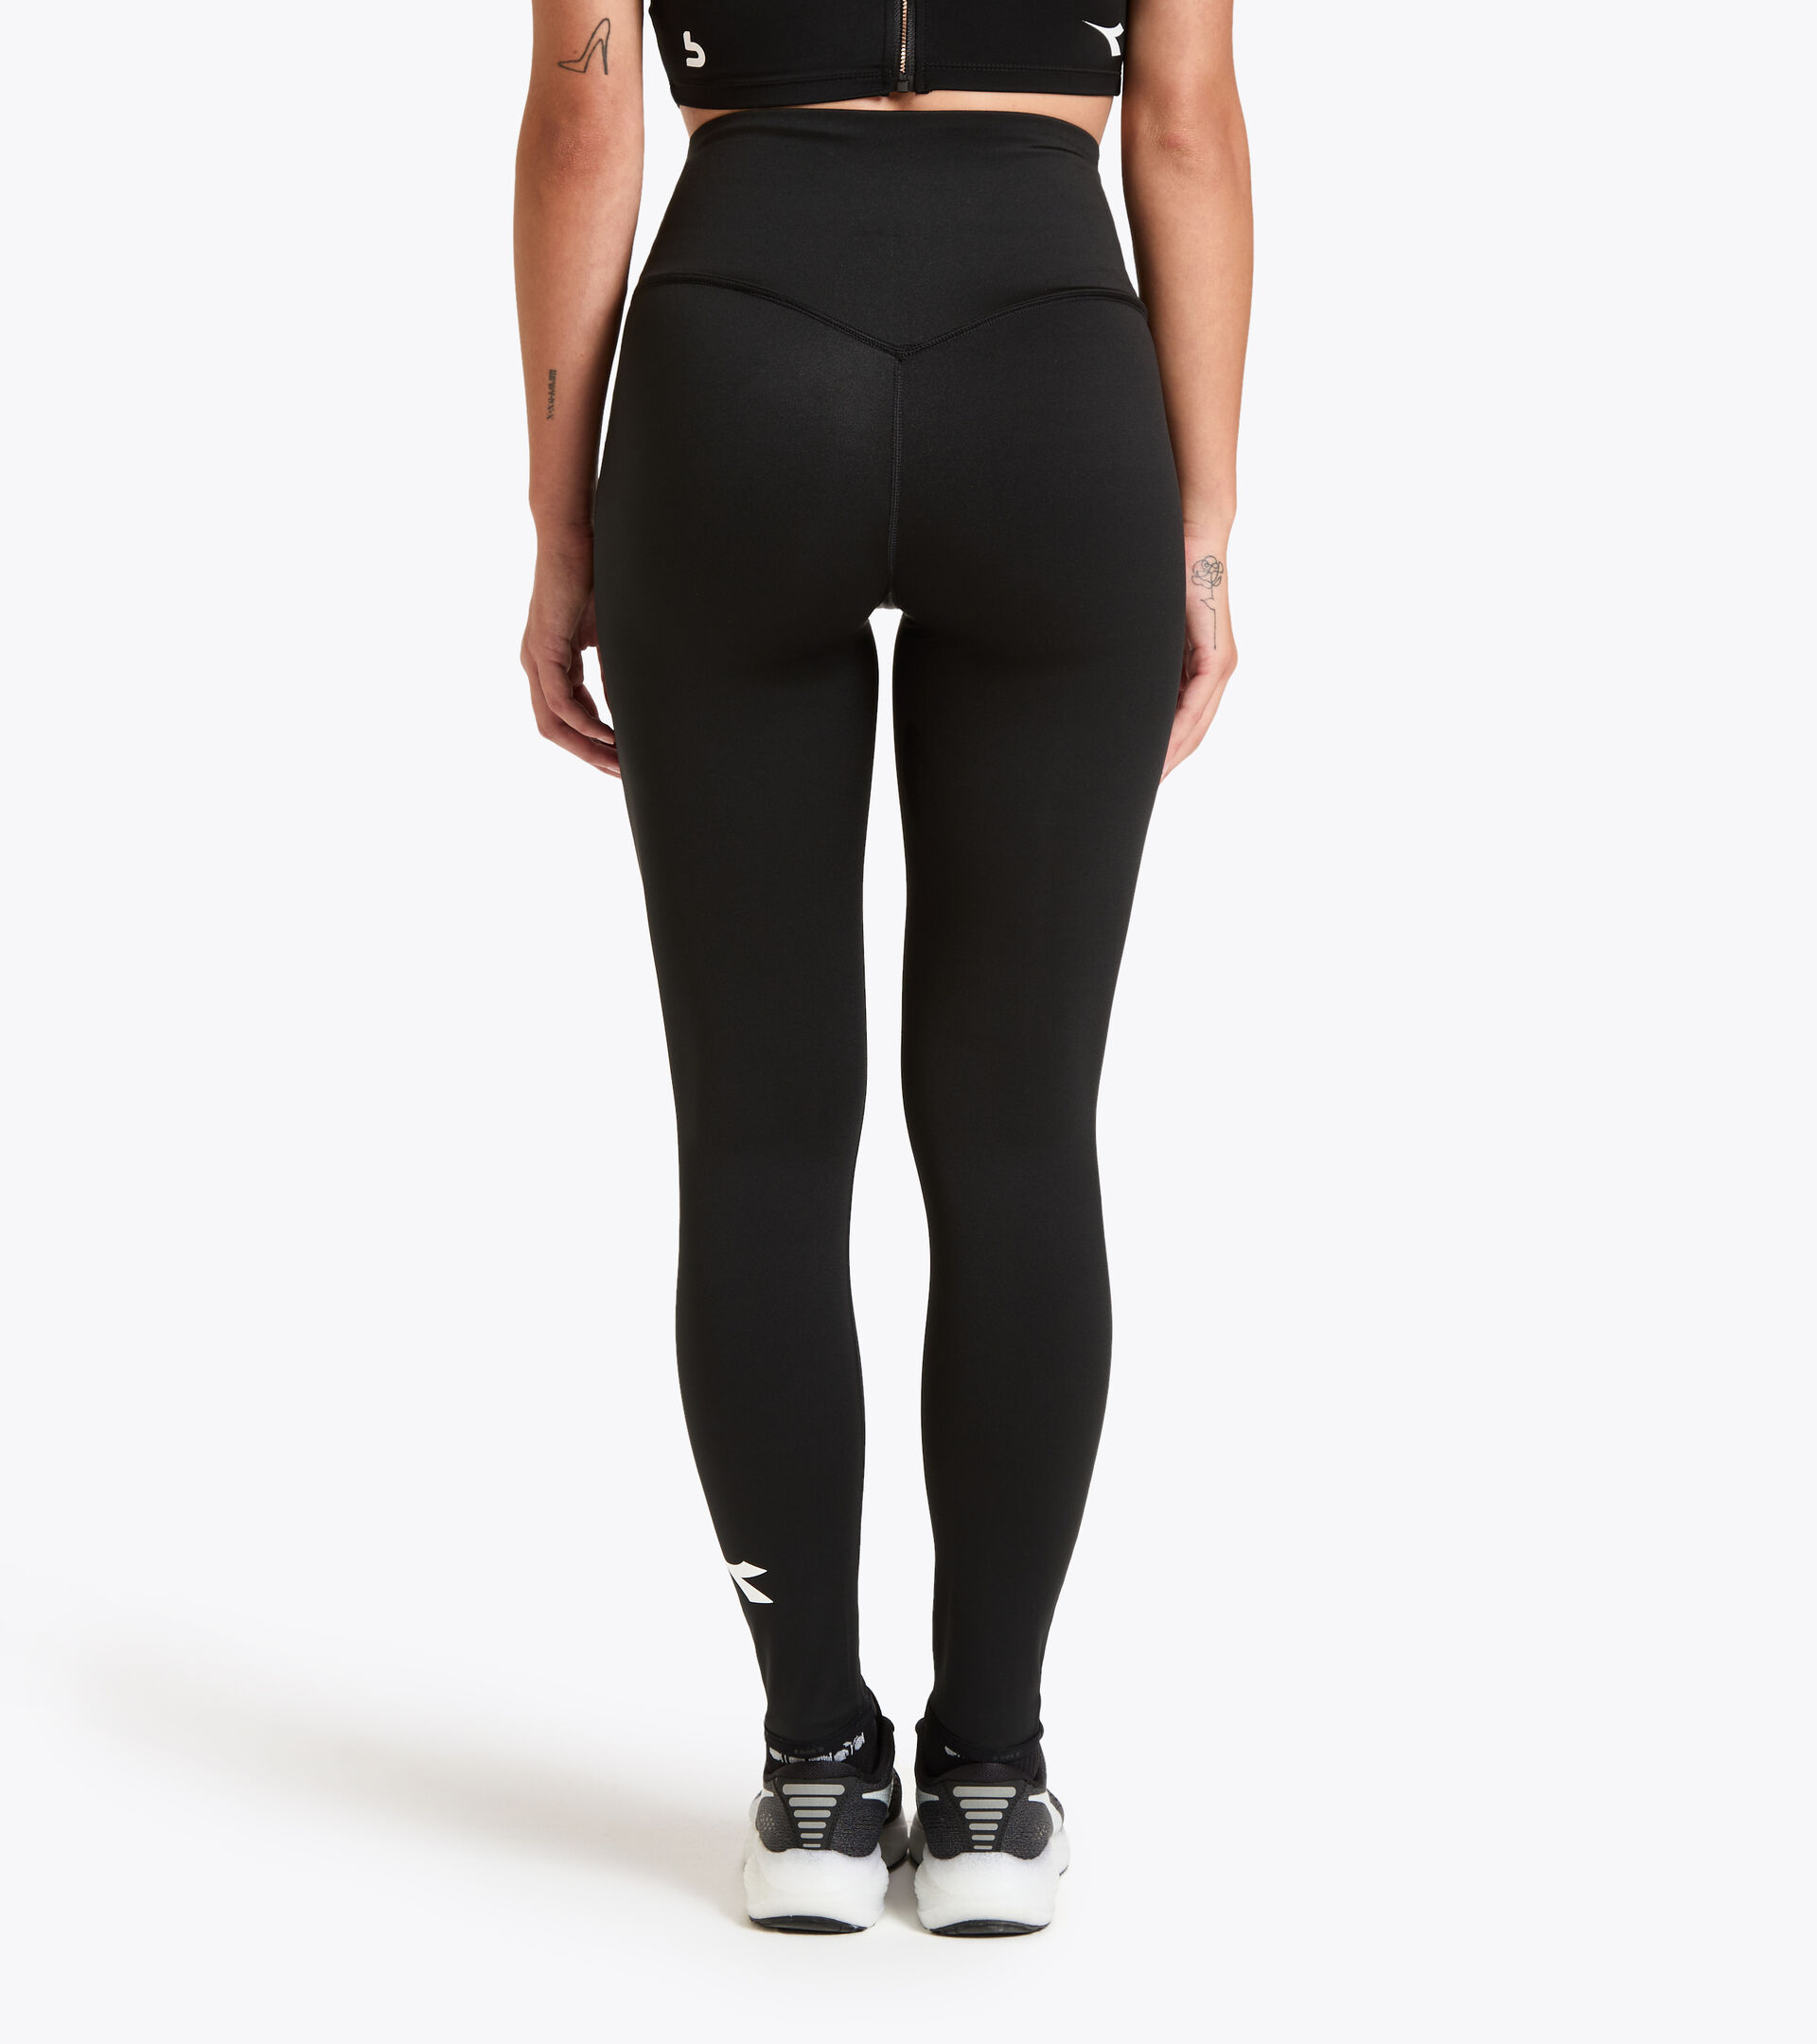 Apparel Sport DONNA L. HW RUNNING TIGHTS BUDDYFIT BLACK Diadora